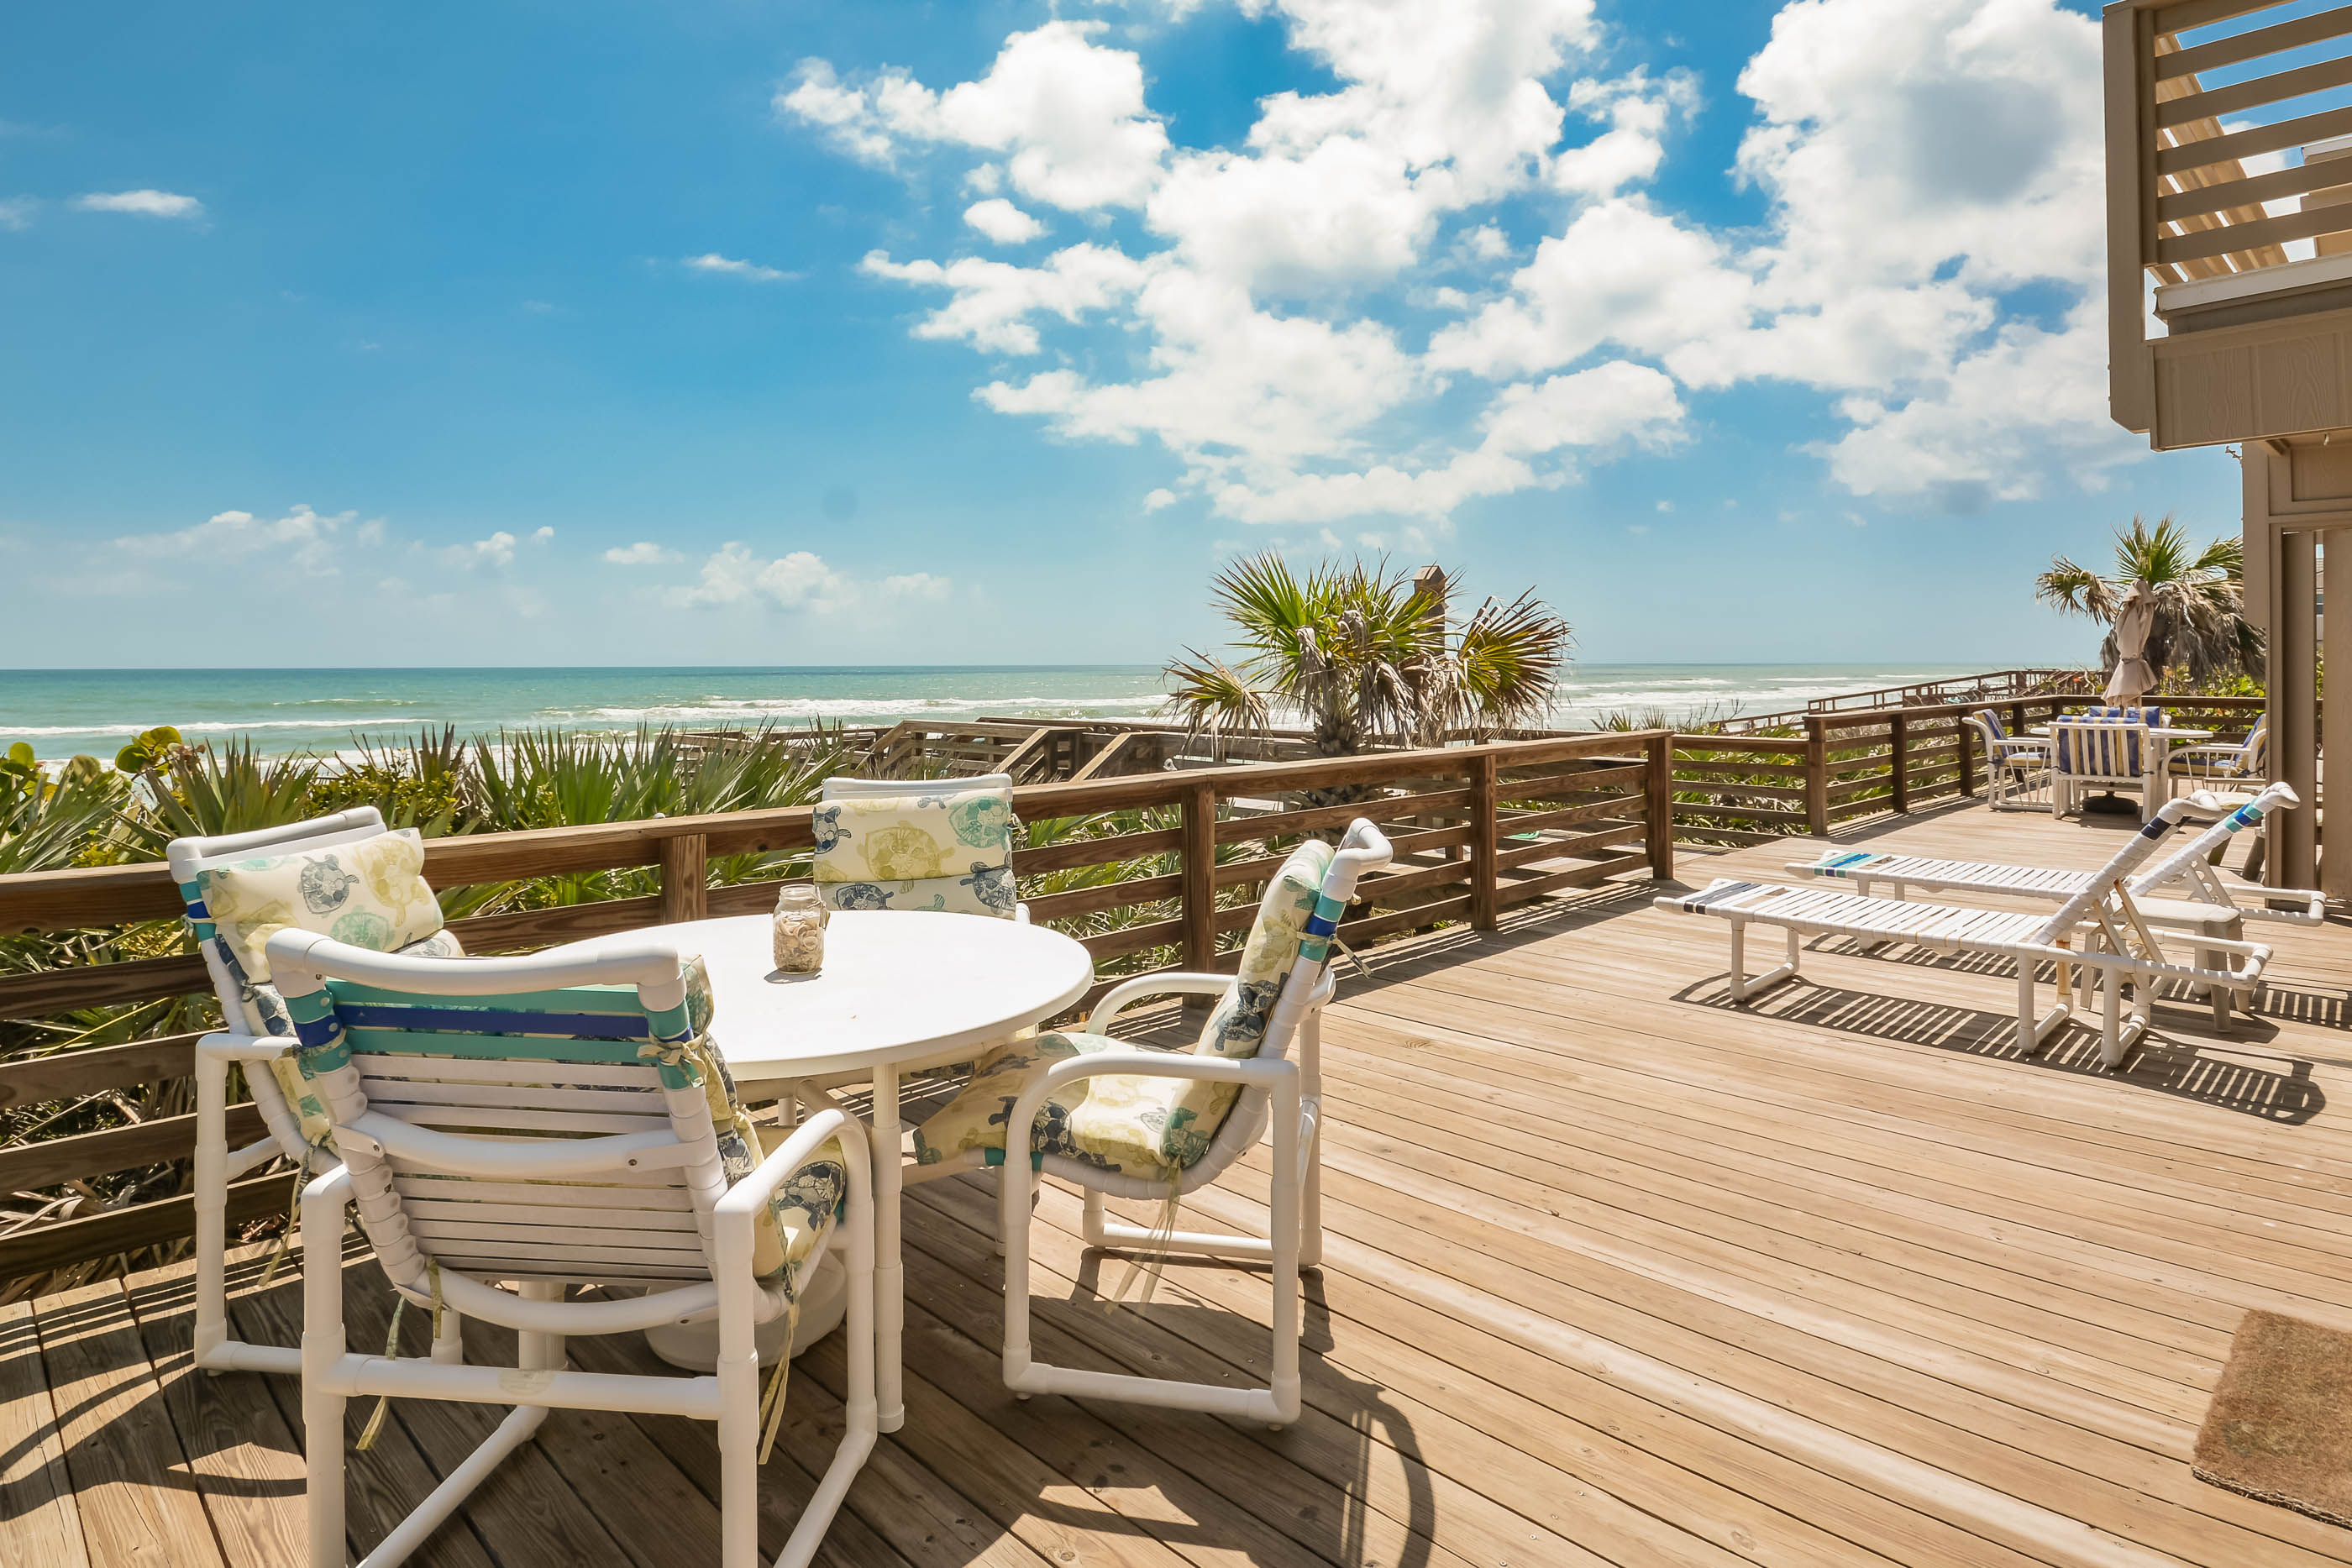 Duplex For Rent In New Smyrna Beach Florida